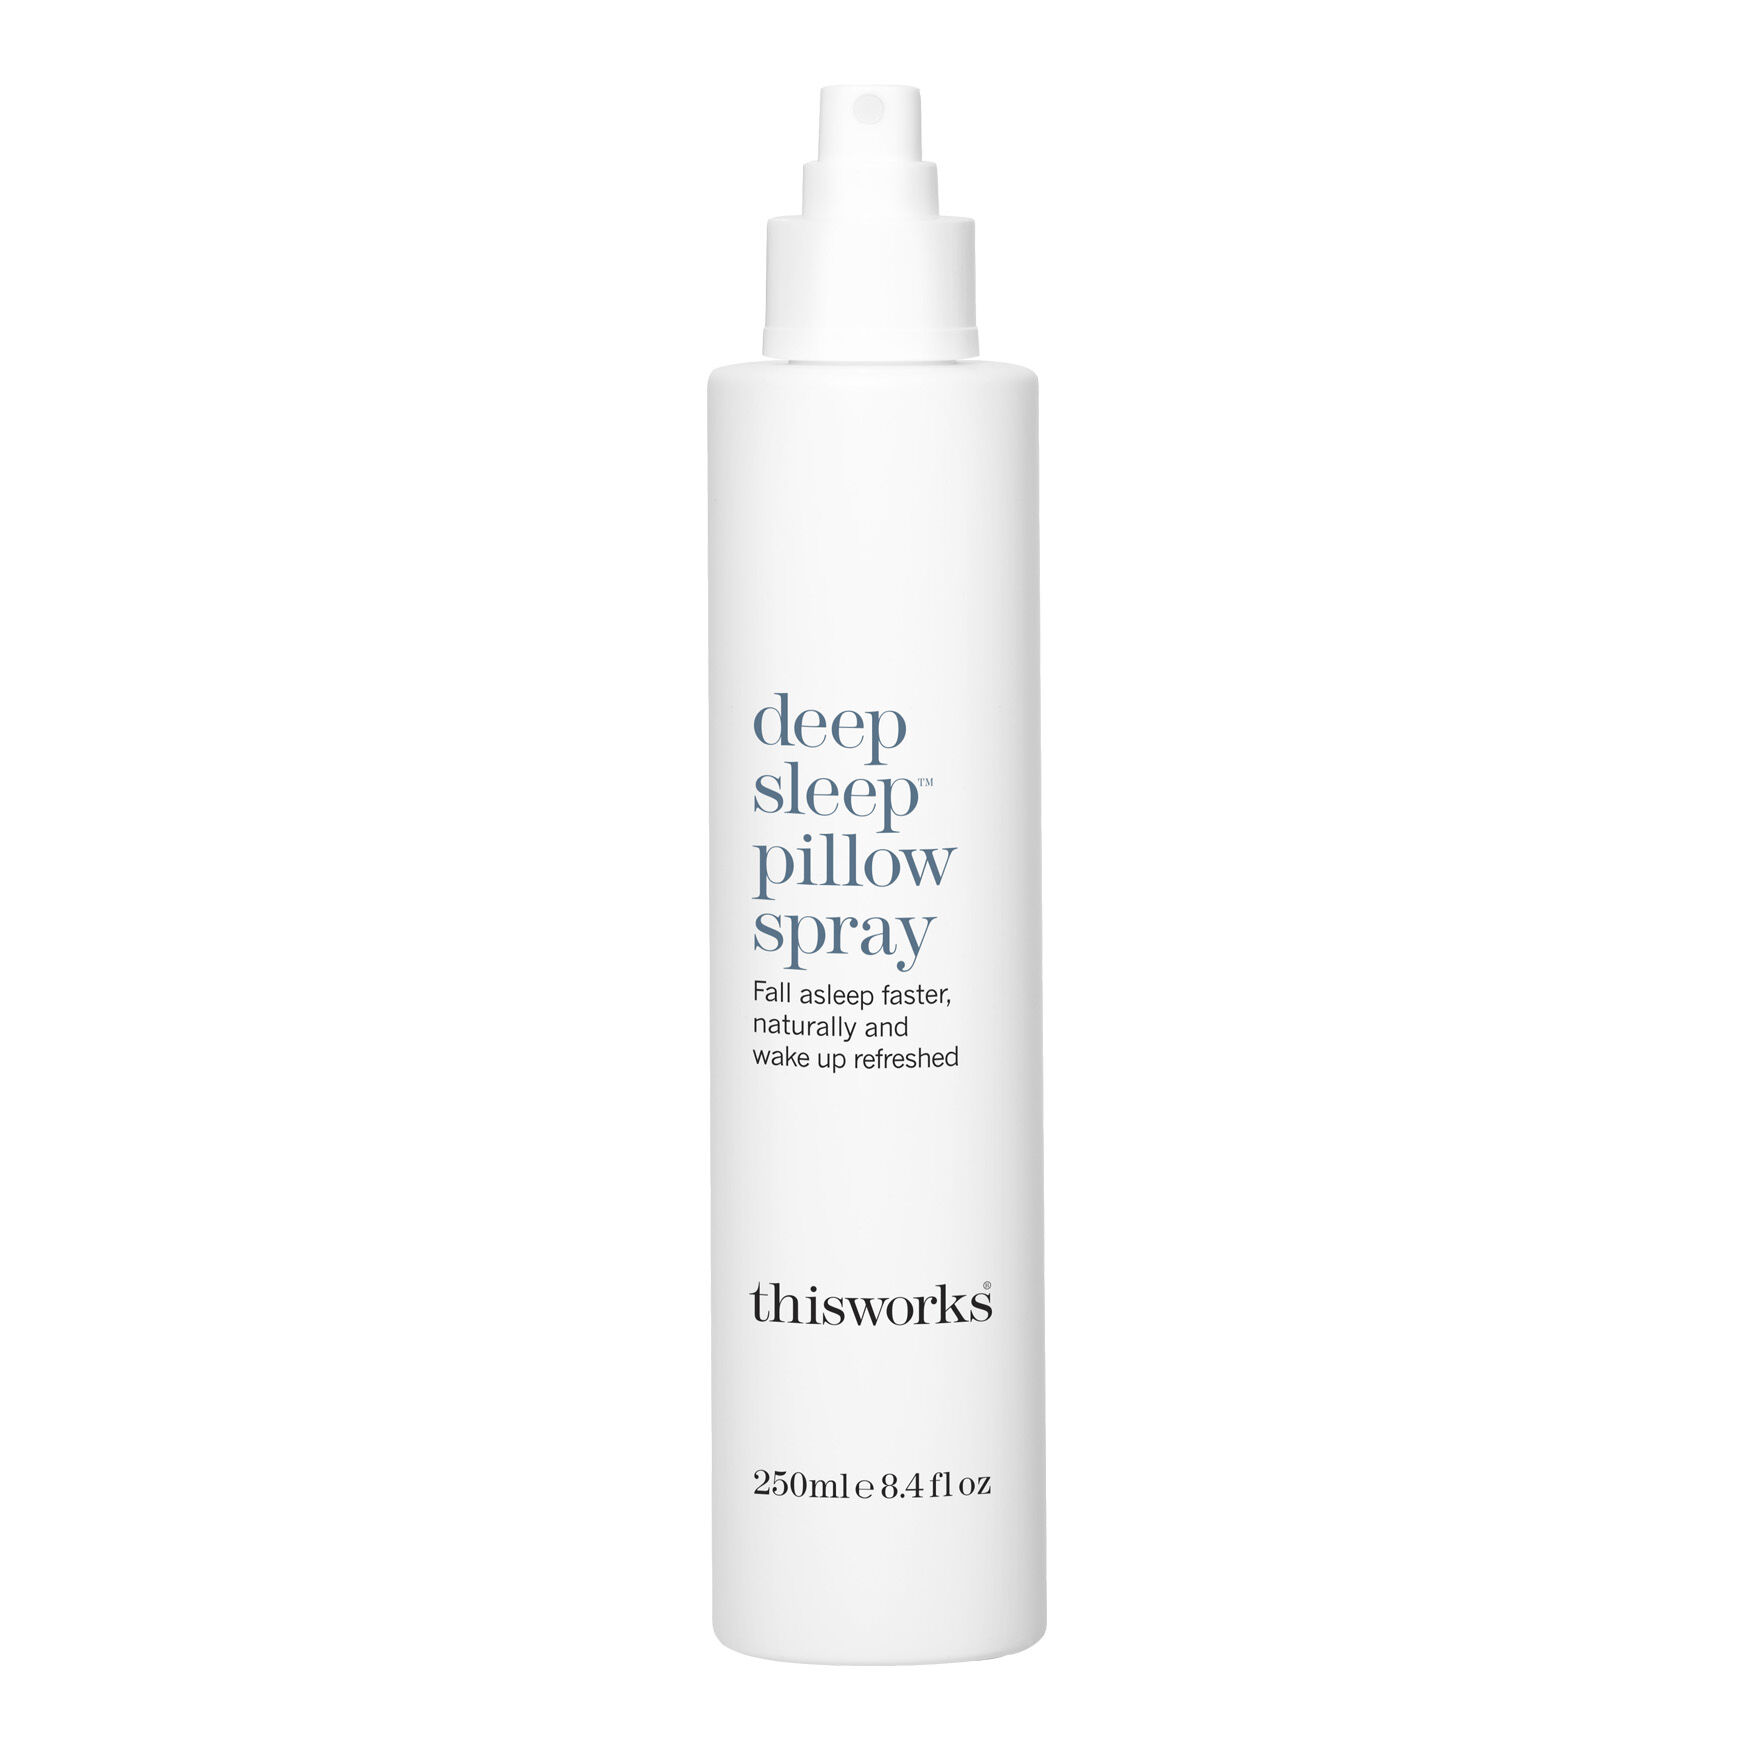 deep sleep pillow spray jumbo size by this works